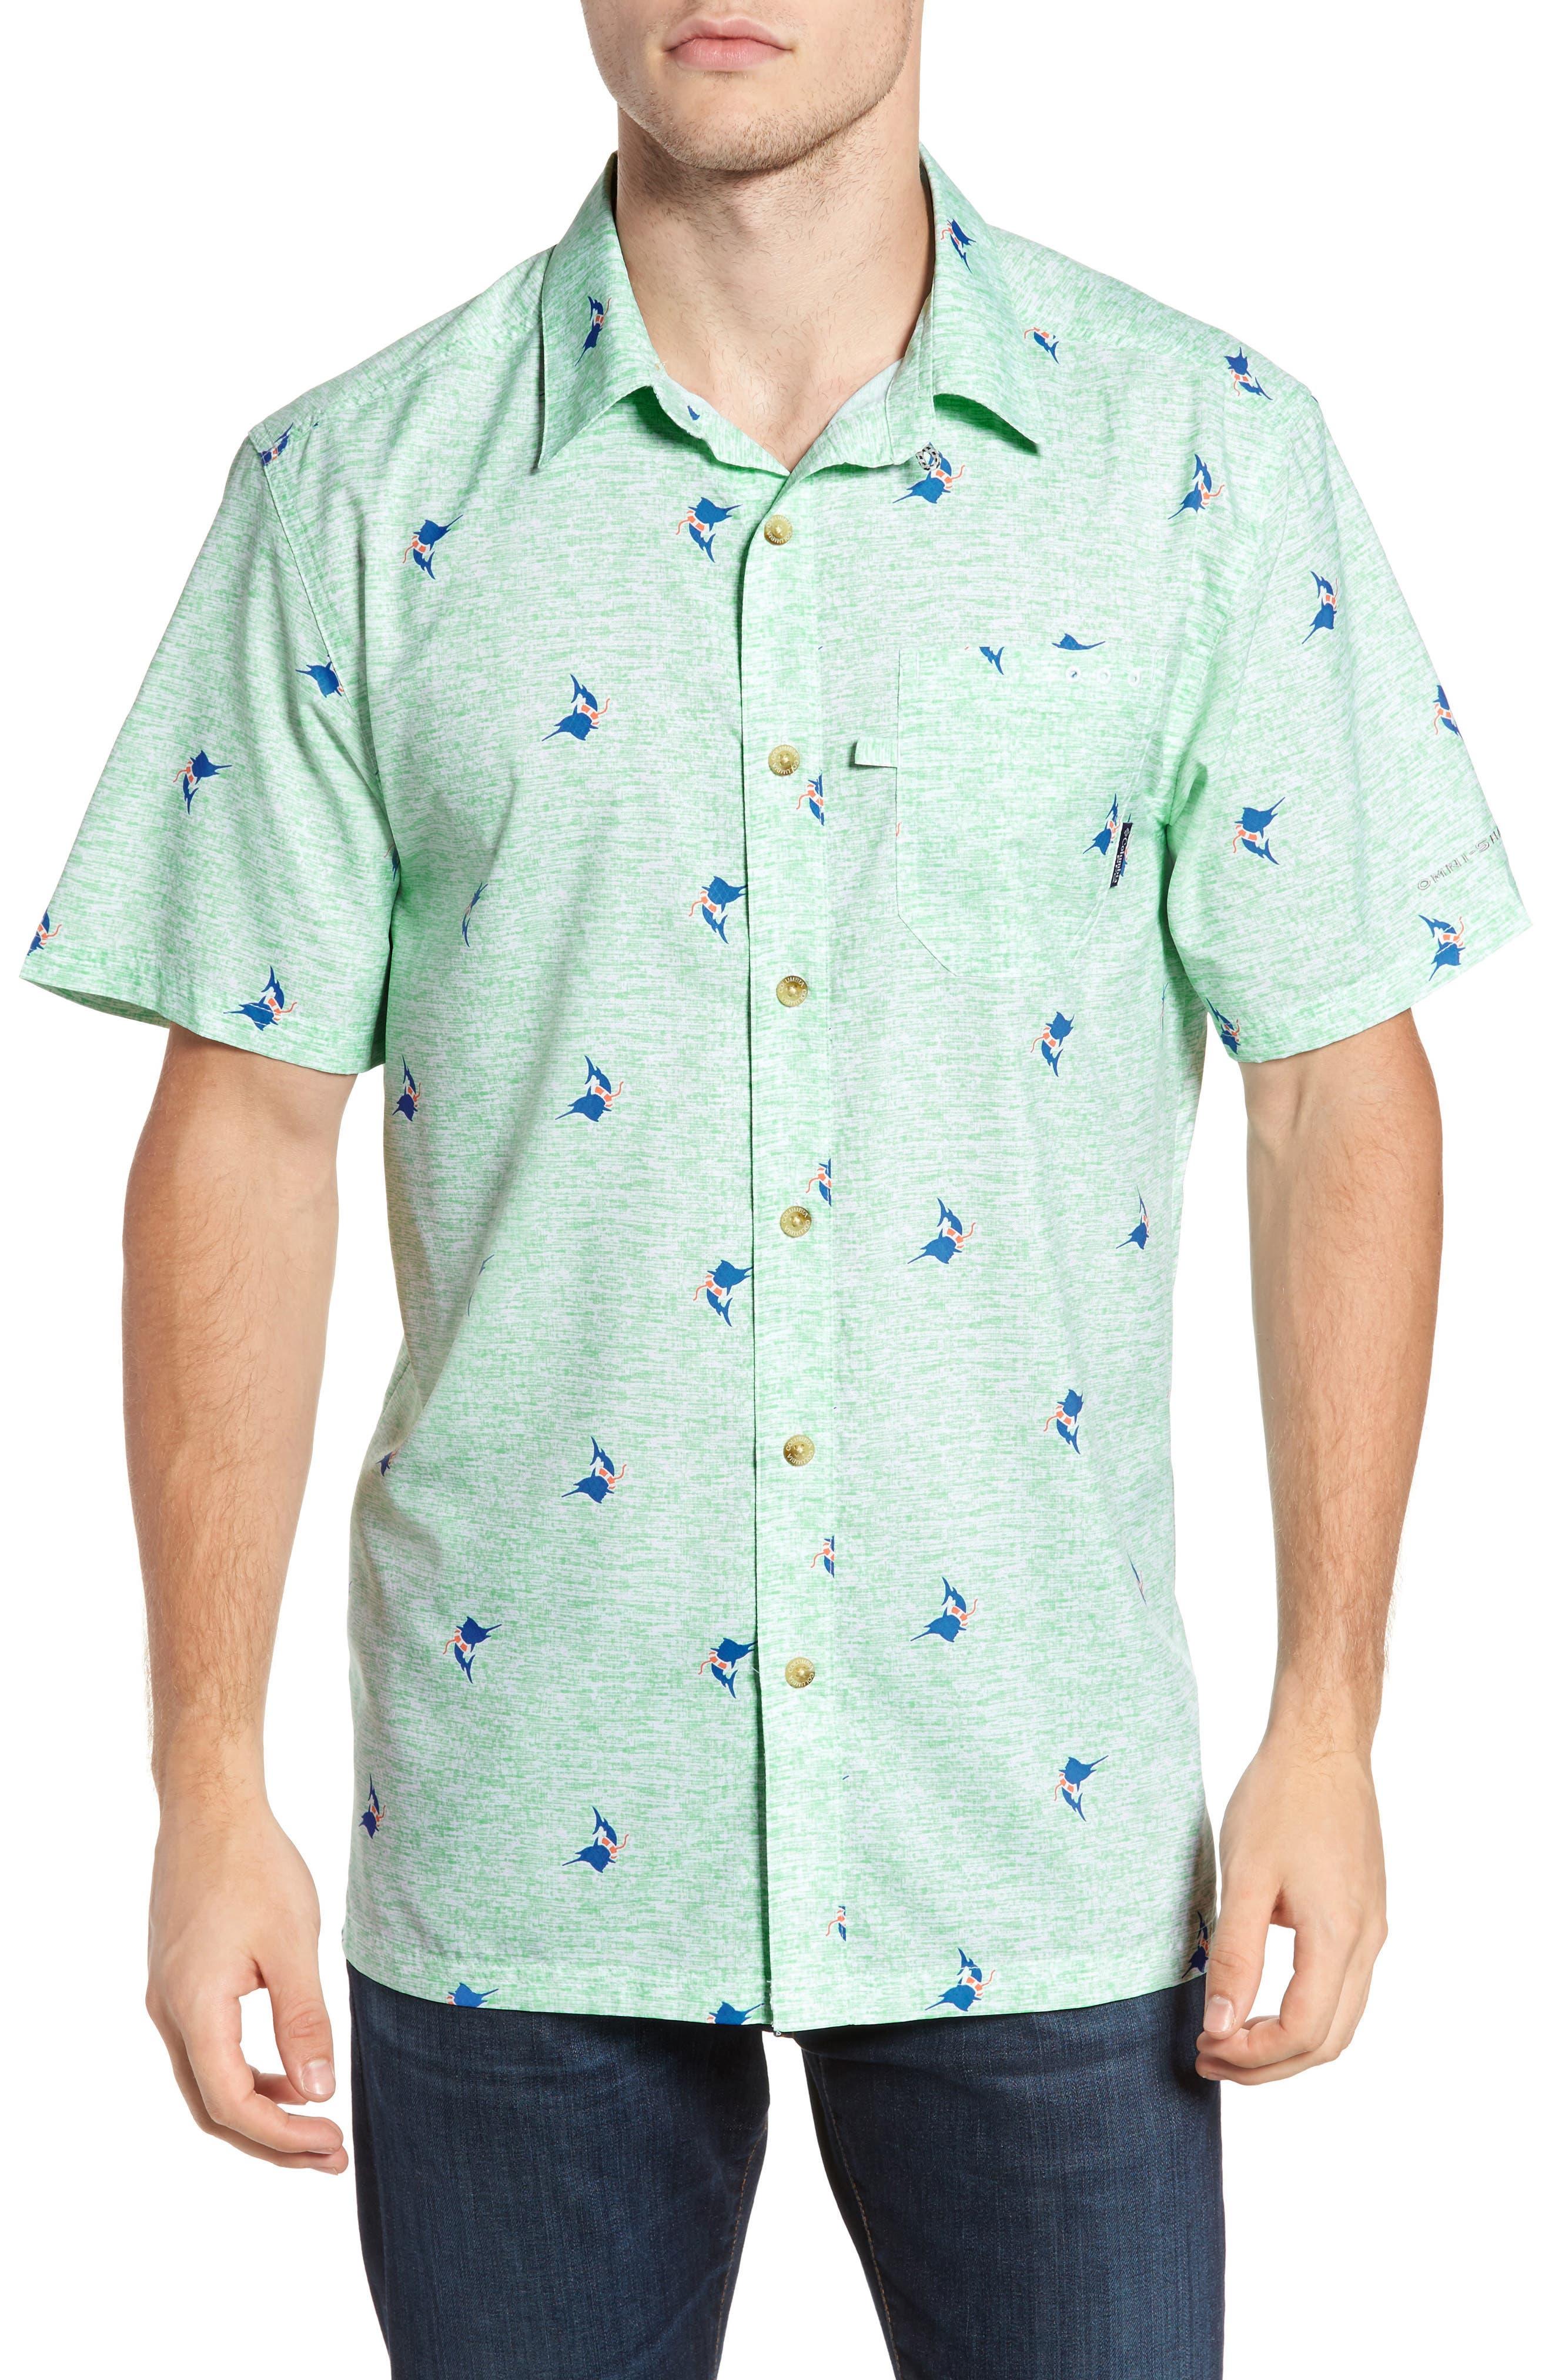 Super Slack Tide Patterned Woven Shirt,                         Main,                         color, Kelp Marlin Print